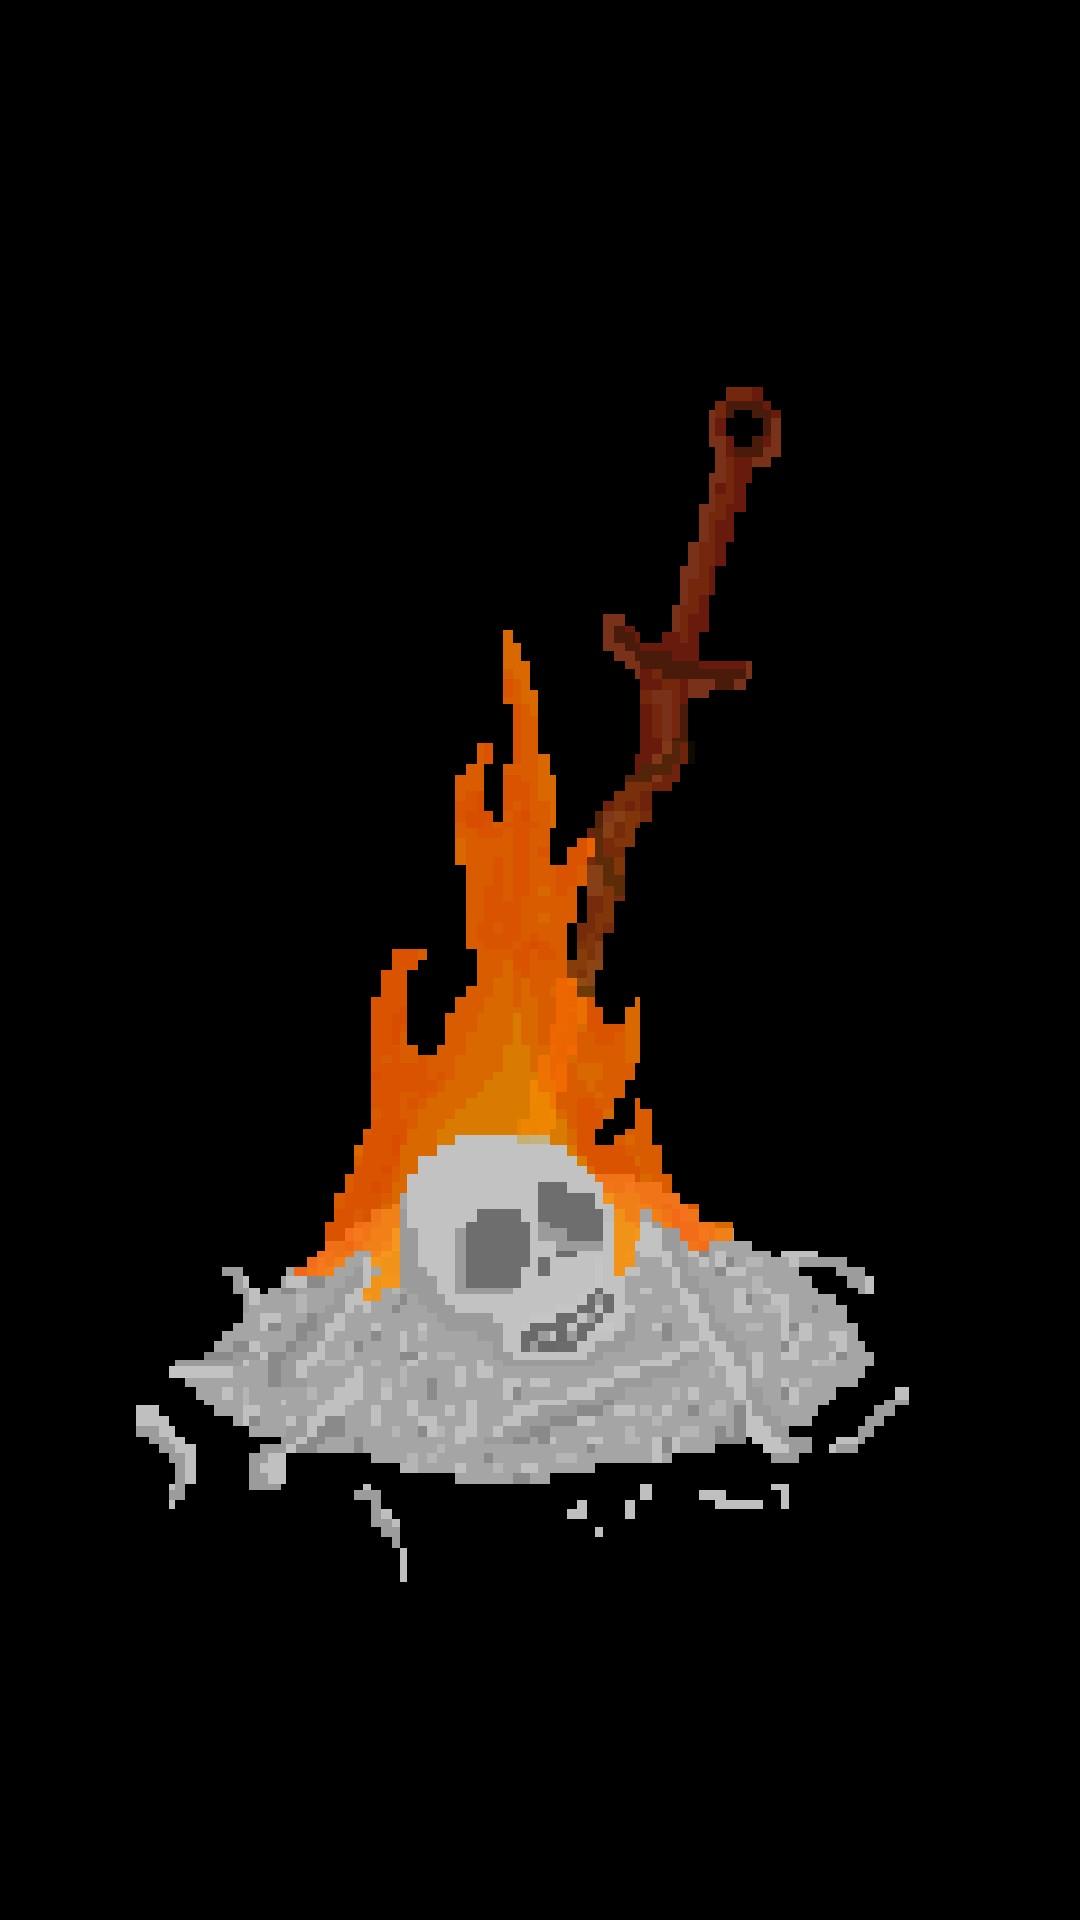 Dark Souls Bonfire Wallpaper 183 ① Download Free Amazing High